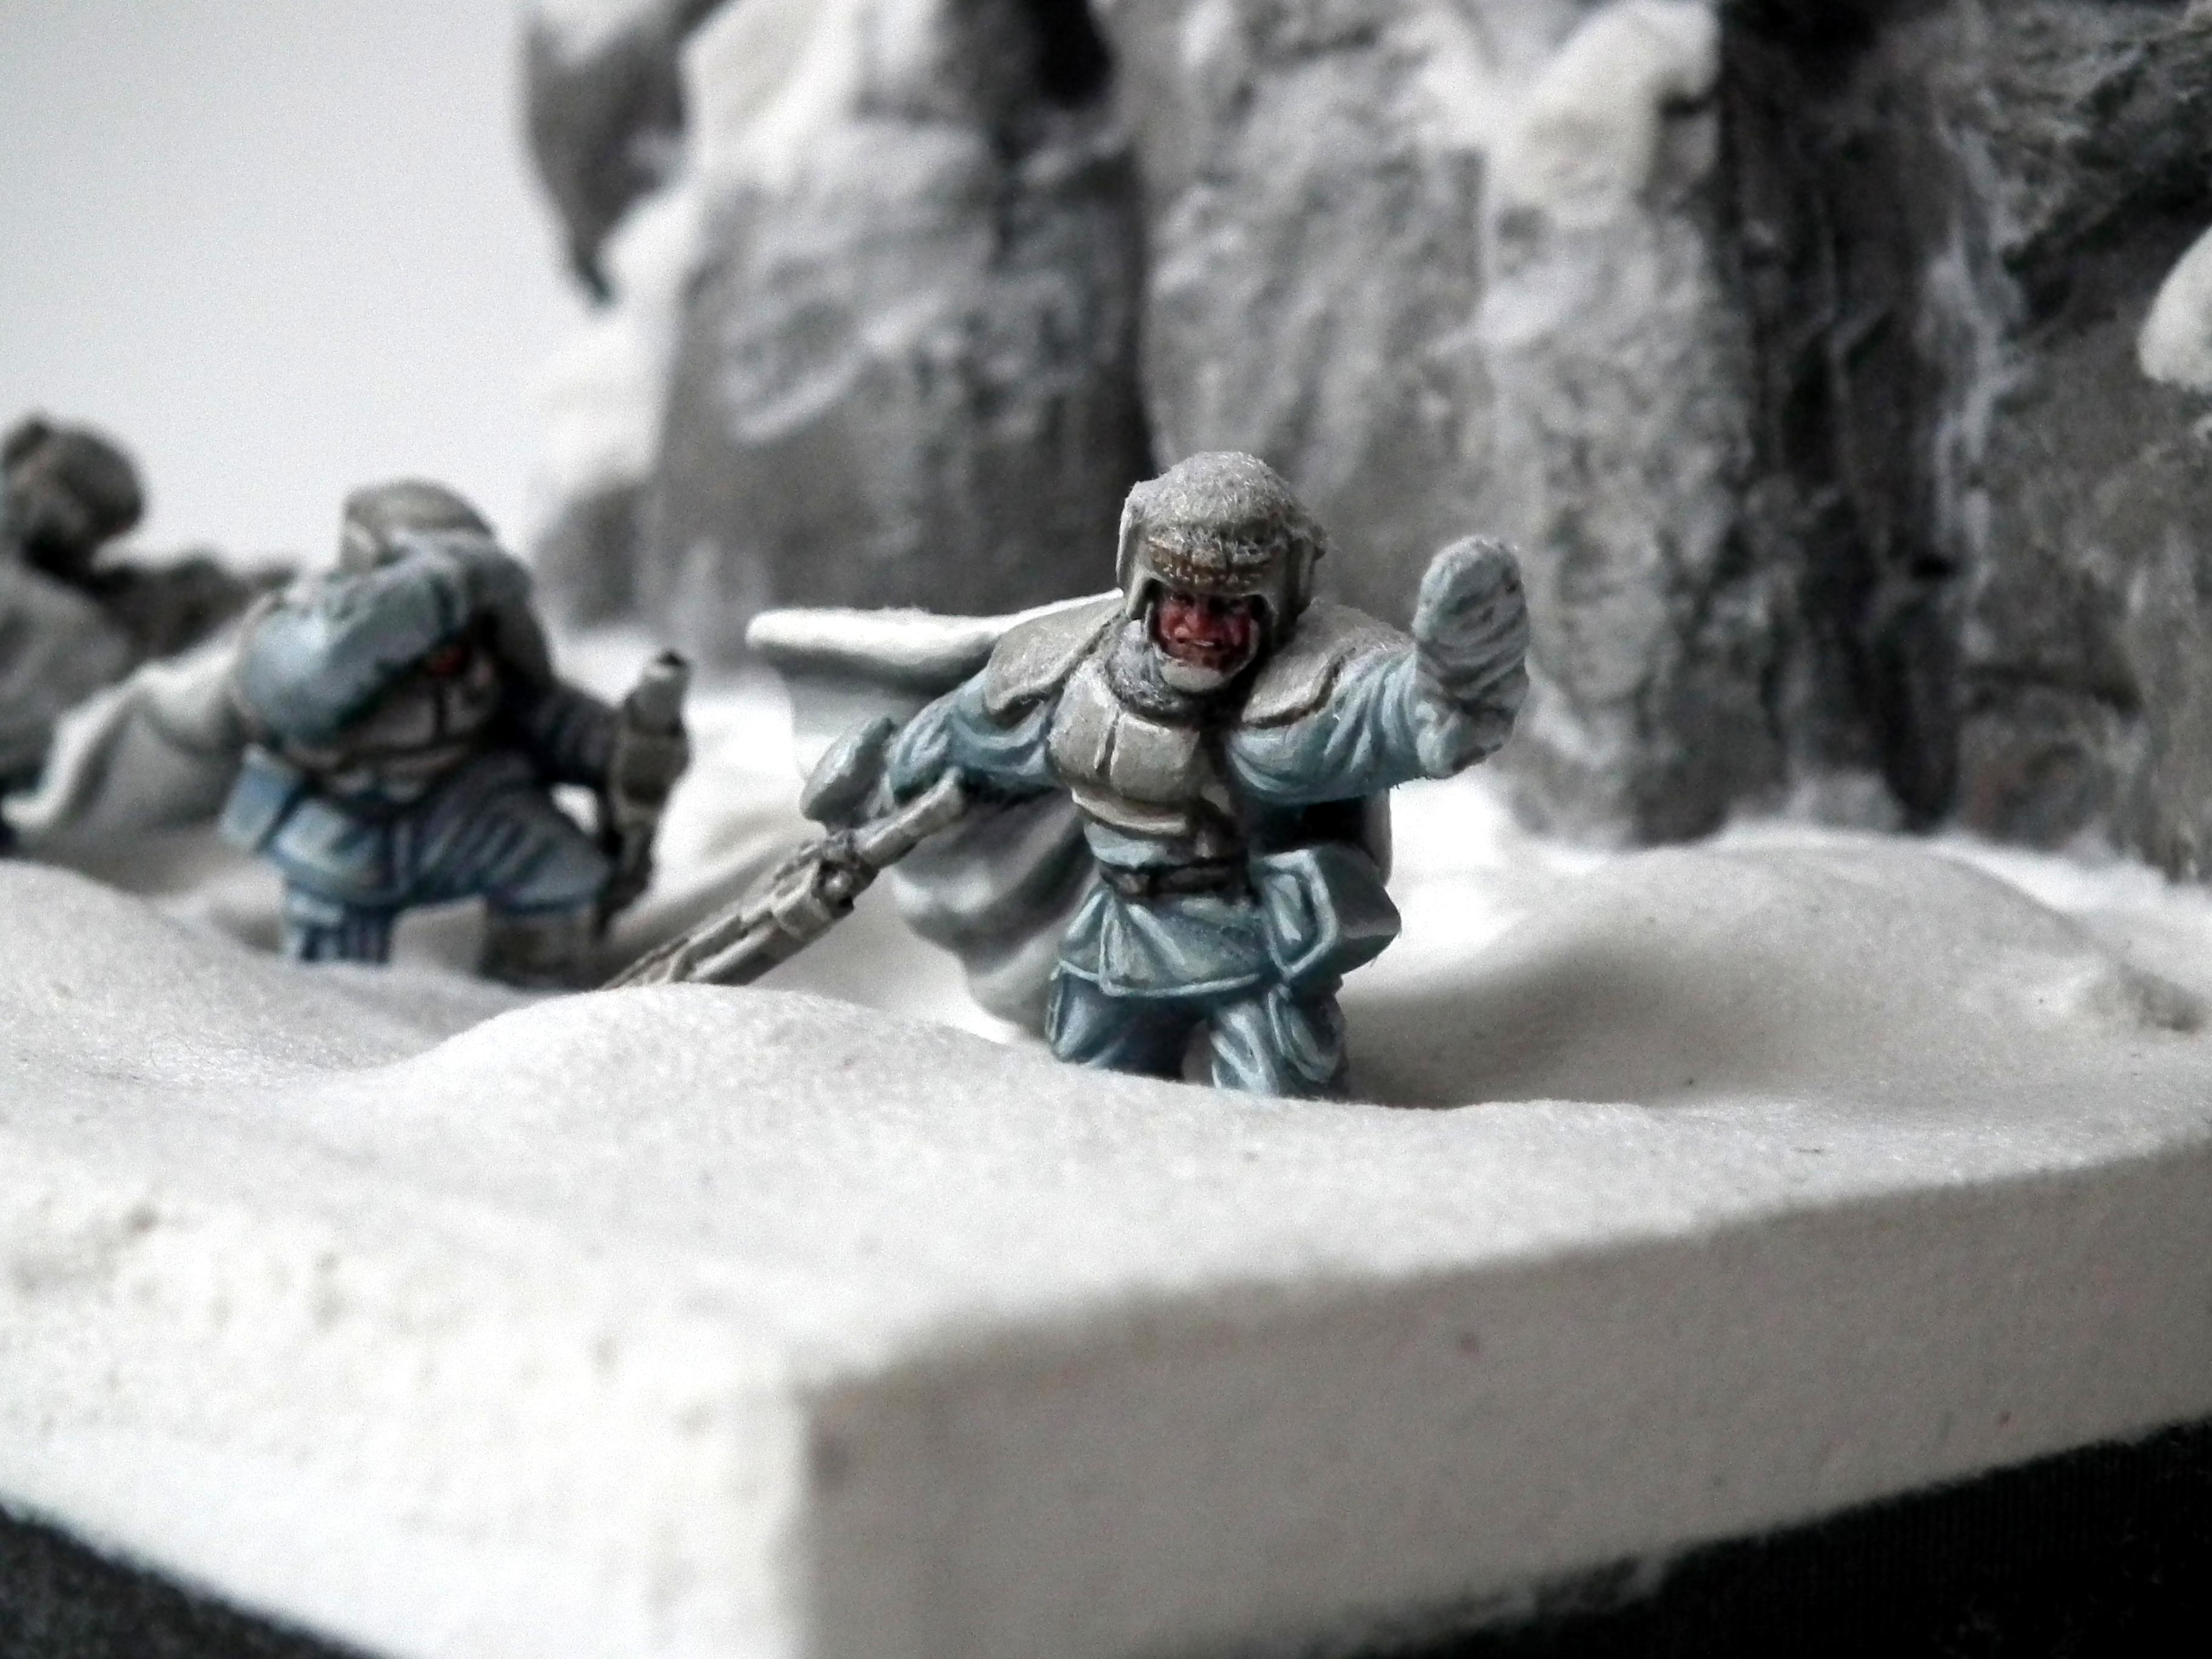 Ambush, Ameazing, Camouflage, Diorama, Duel, Hills, Imperial Guard, Nice, Pathfinders, Perfect, Pva, Snow, Warhammer 40'000, Warhammer 40,000, White, Wind, Winter